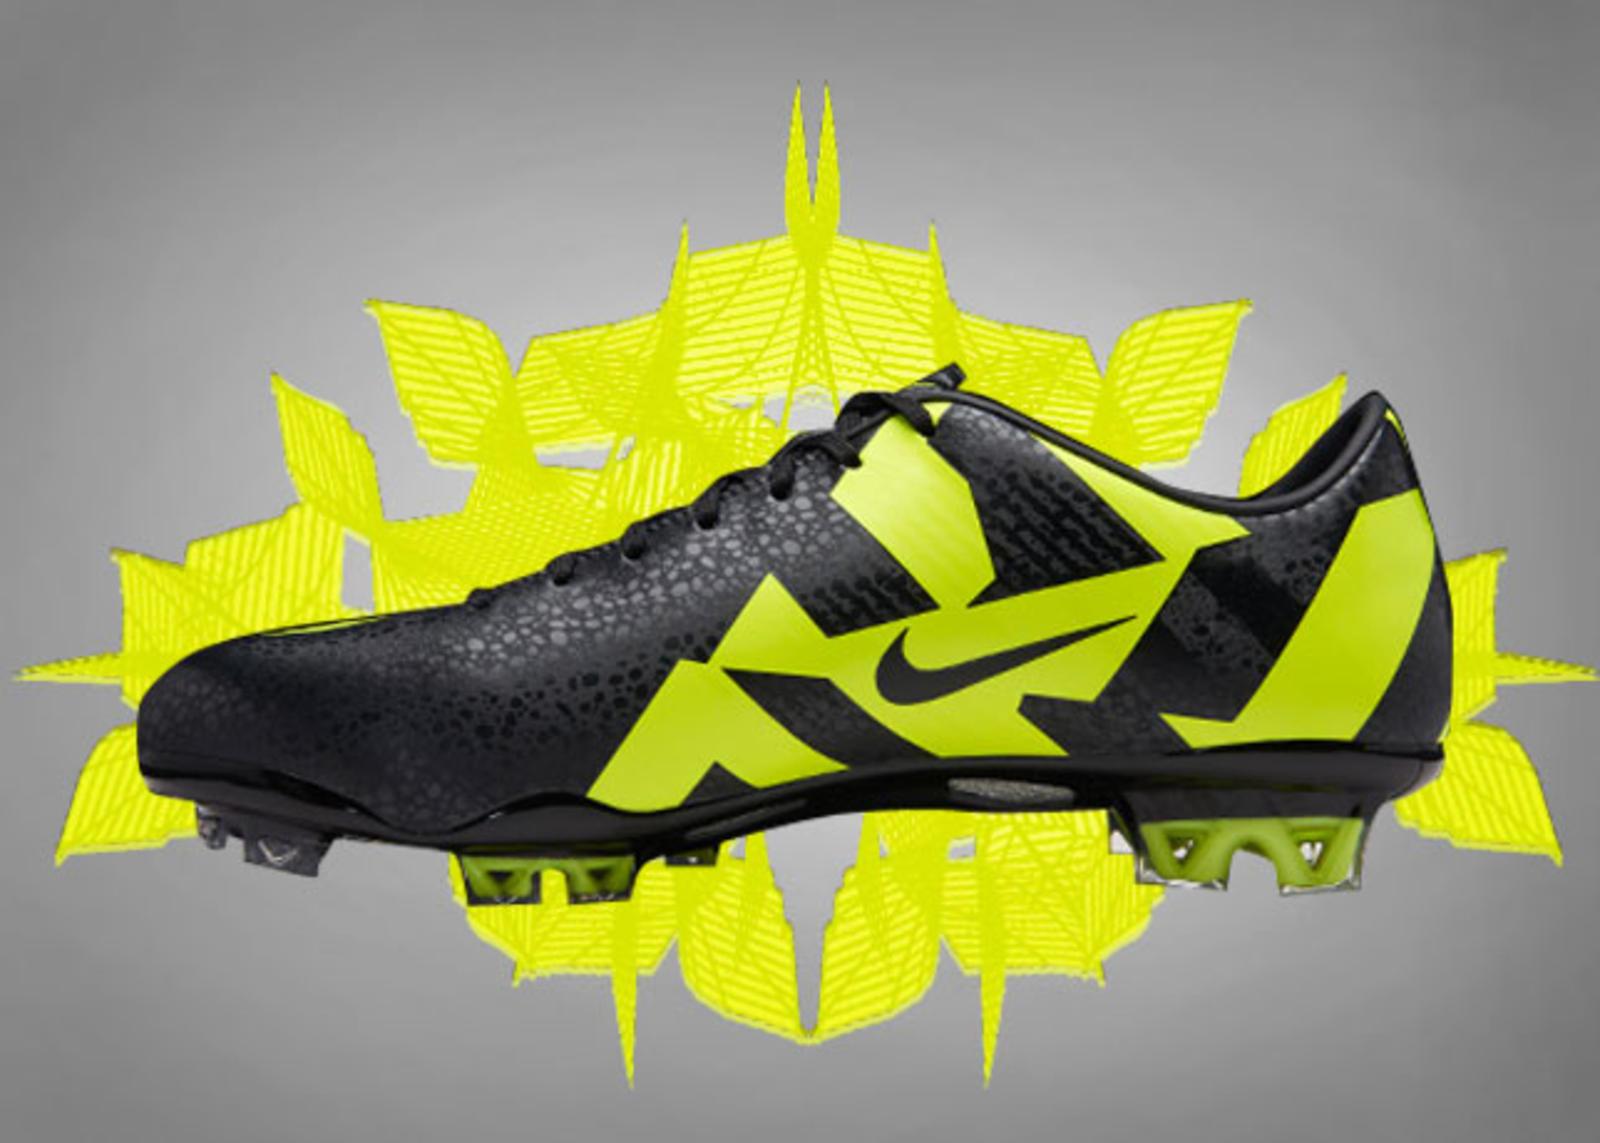 nike free 3.0 cross trainer nike mercurial sock boots cheap